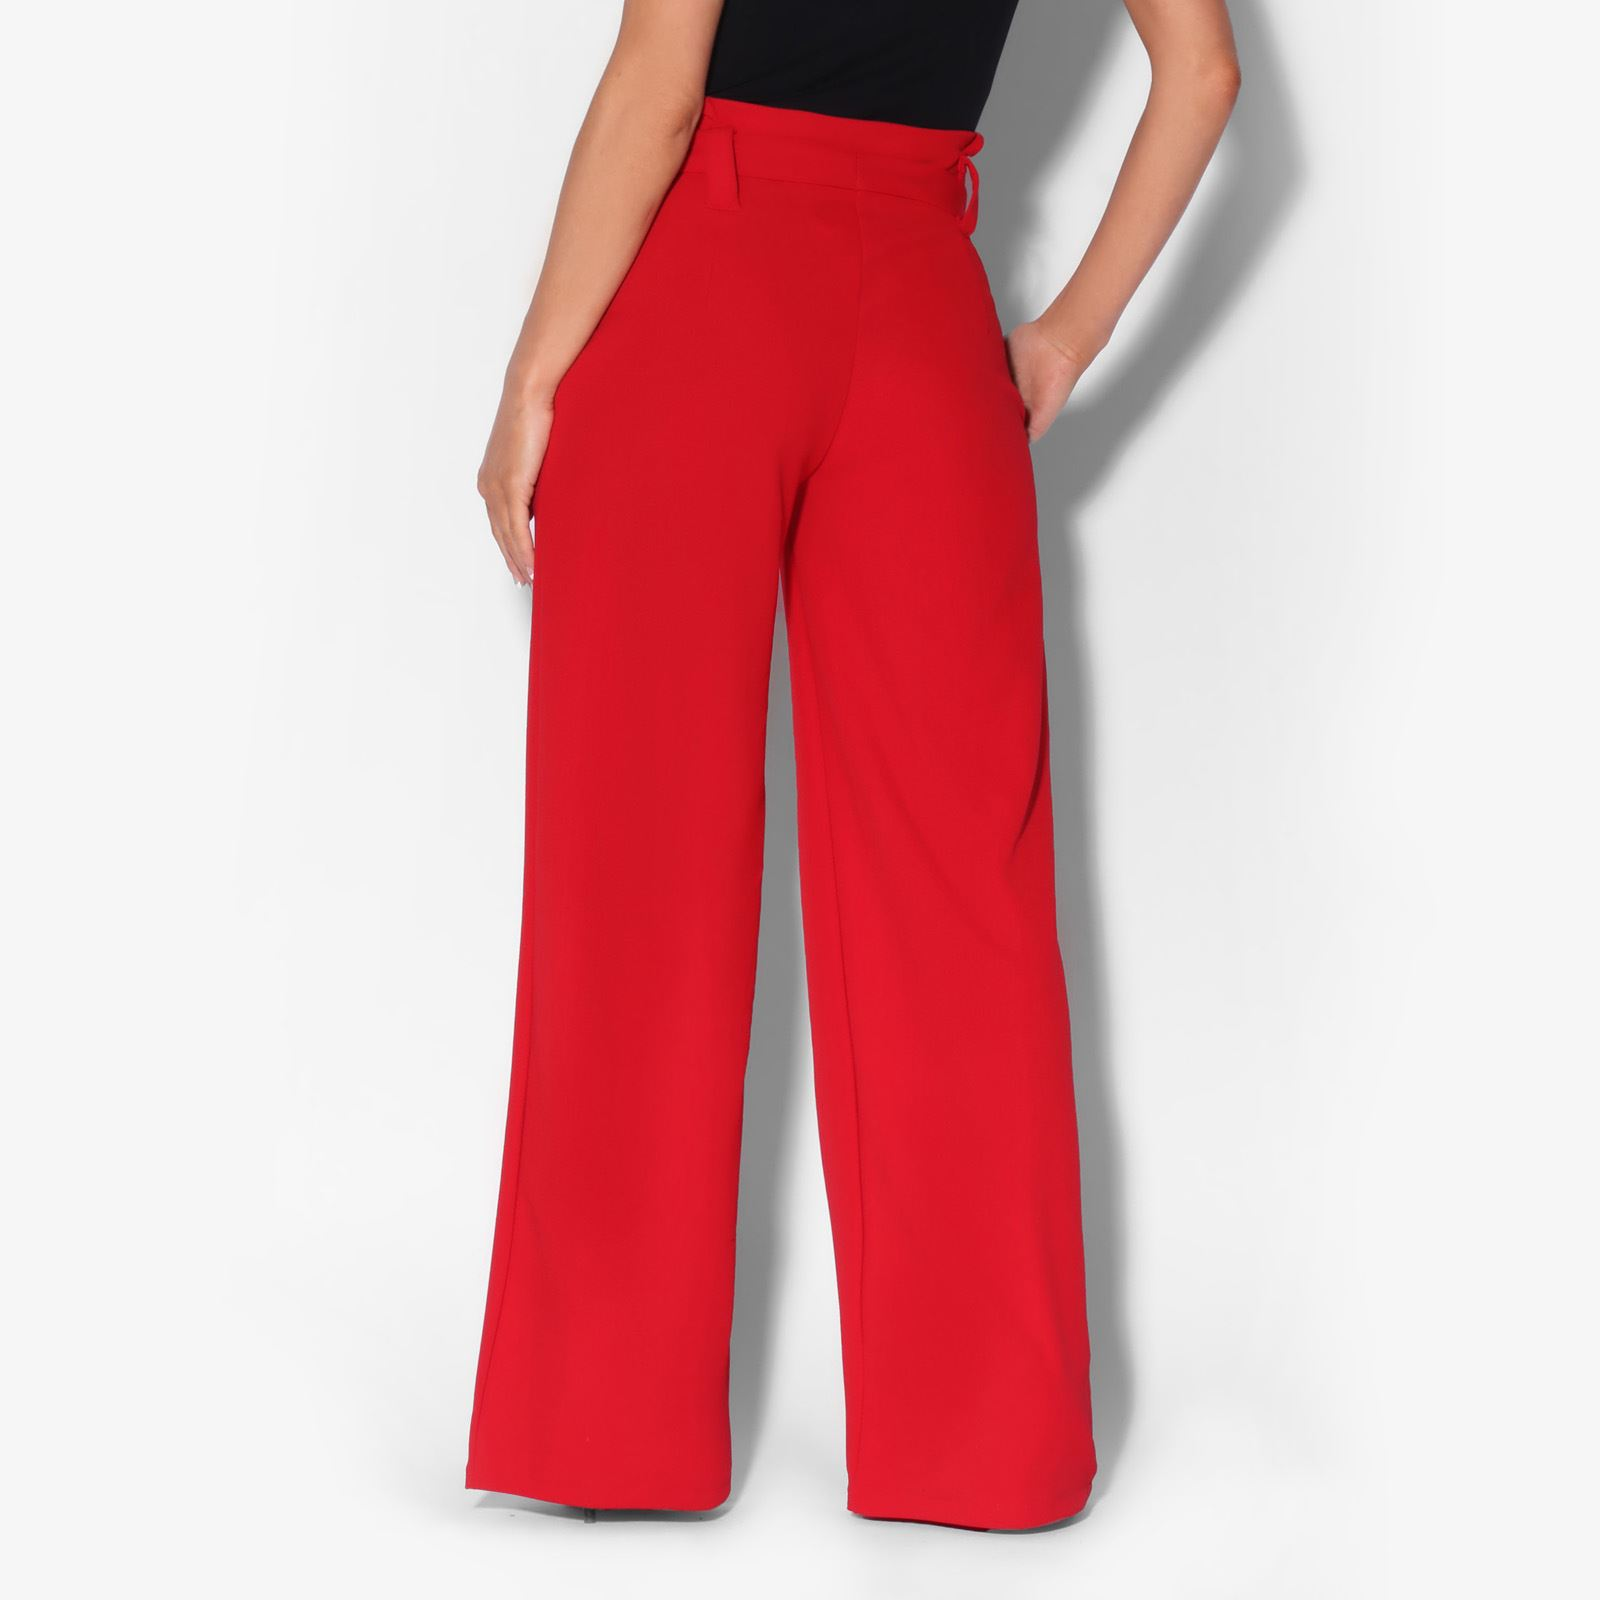 Womens-Ladies-High-Waist-Wide-Leg-Trousers-Paper-Bag-Flared-Leg-Palazzo-Pants thumbnail 7